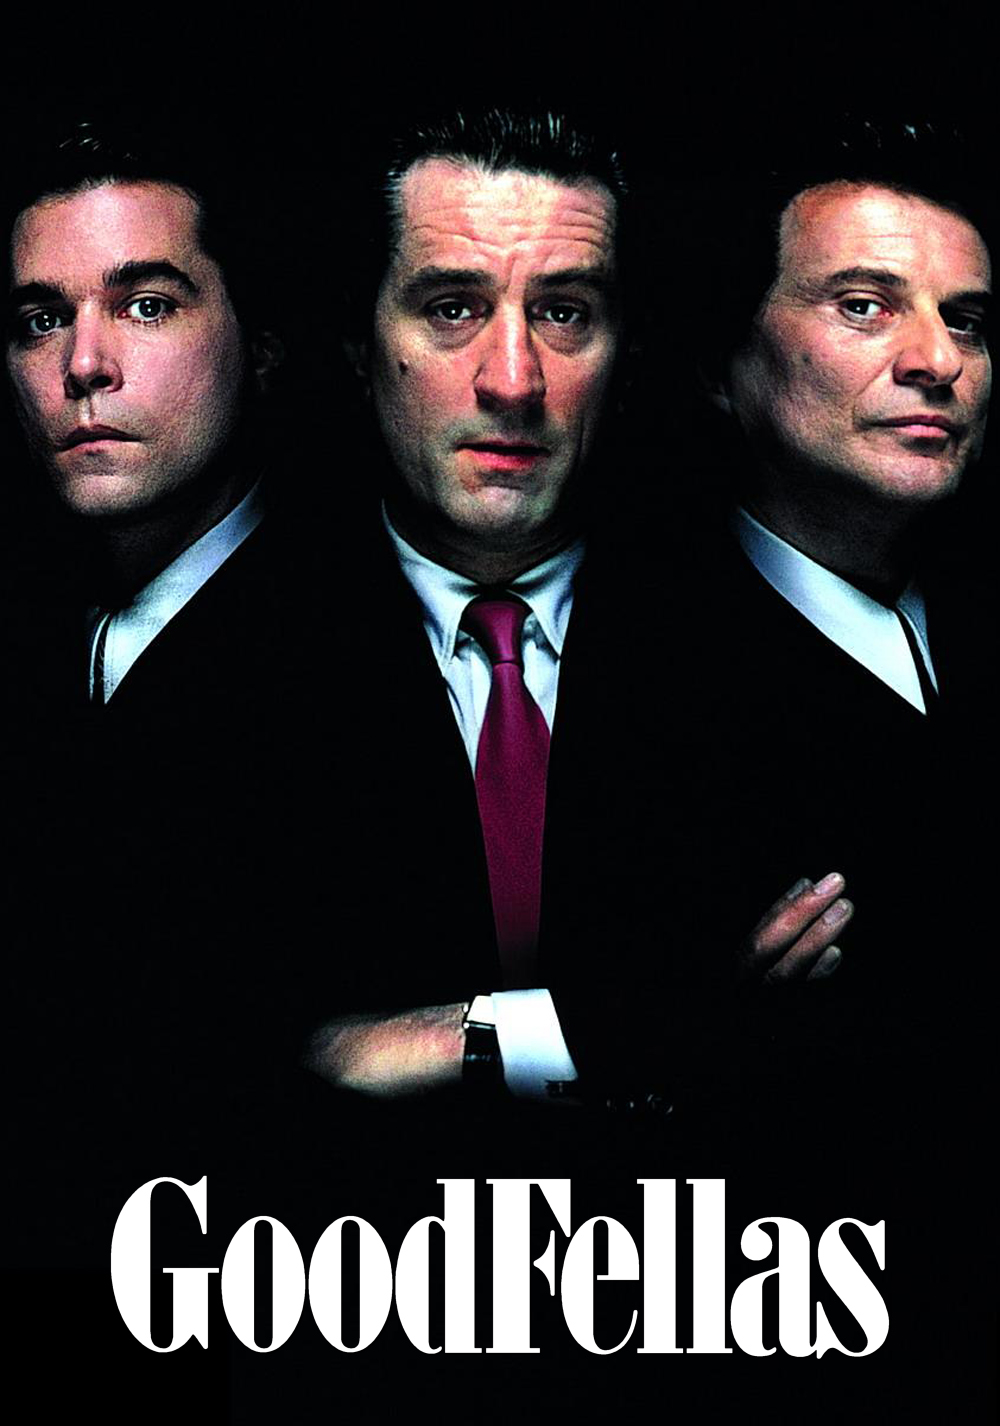 goodfellas movie fanart